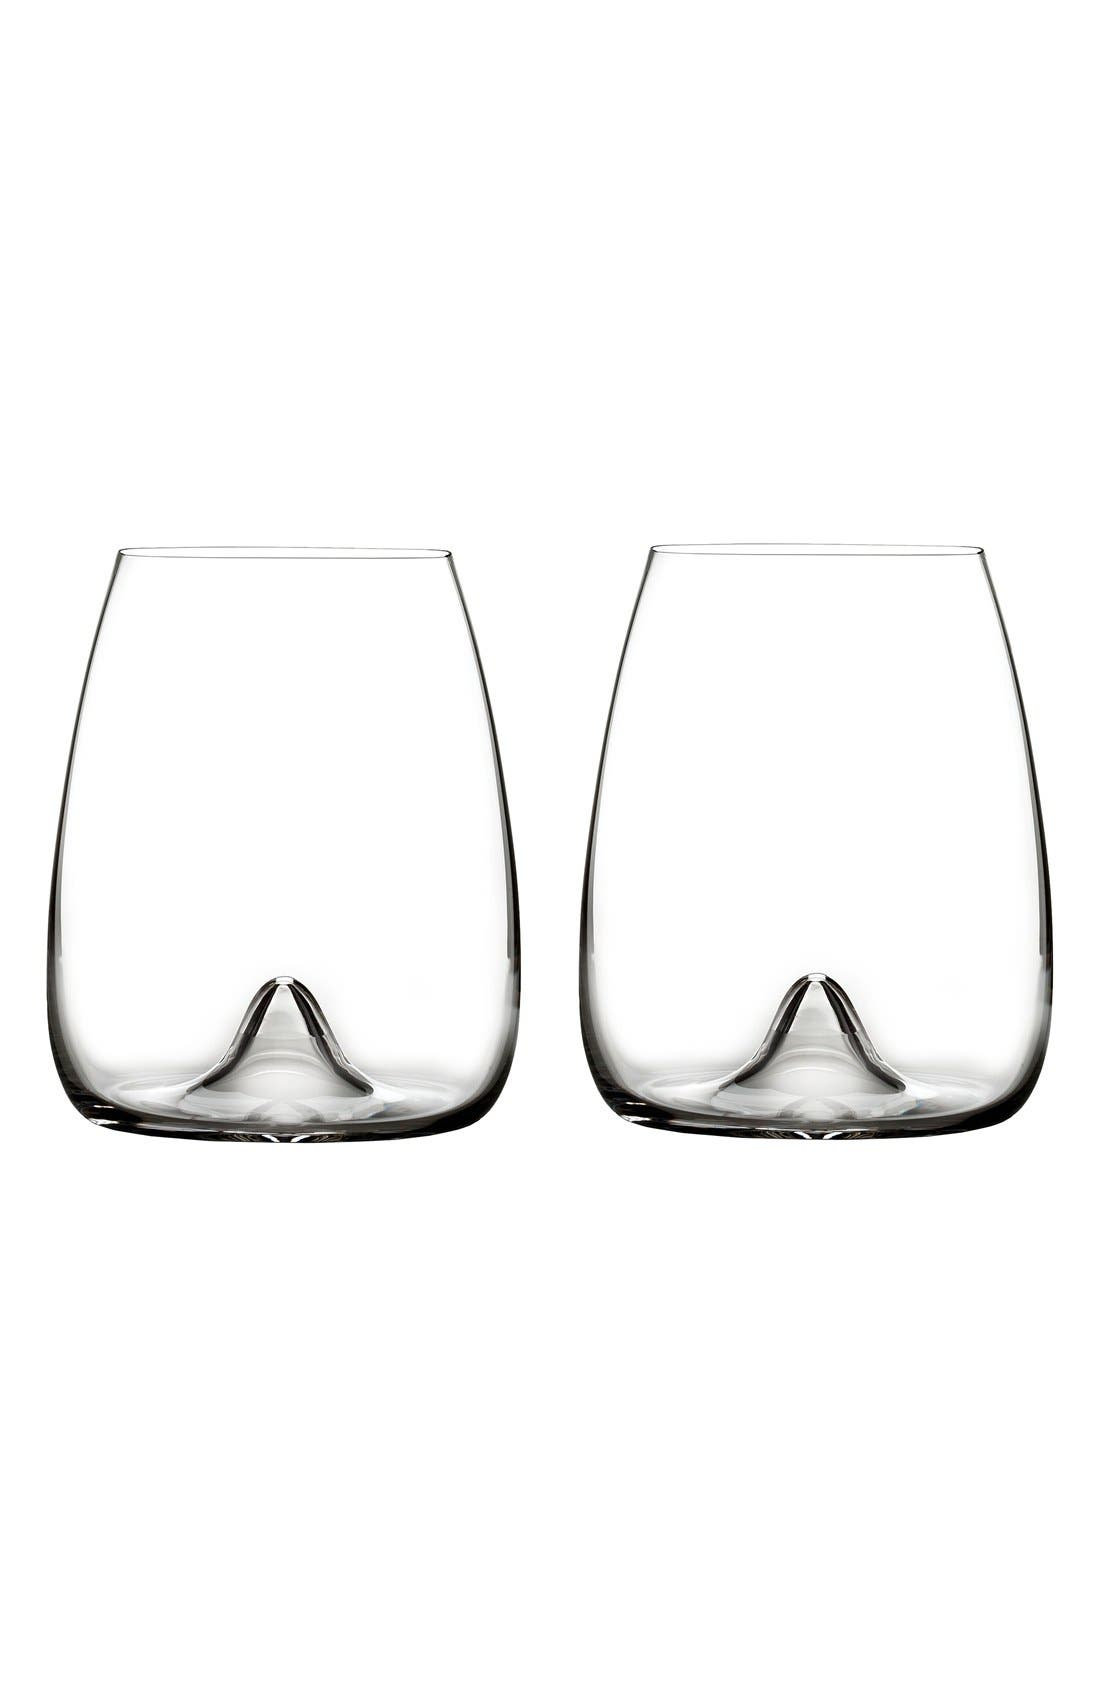 Main Image - Waterford Elegance Set of 2 Fine Crystal Stemless Wine Glasses